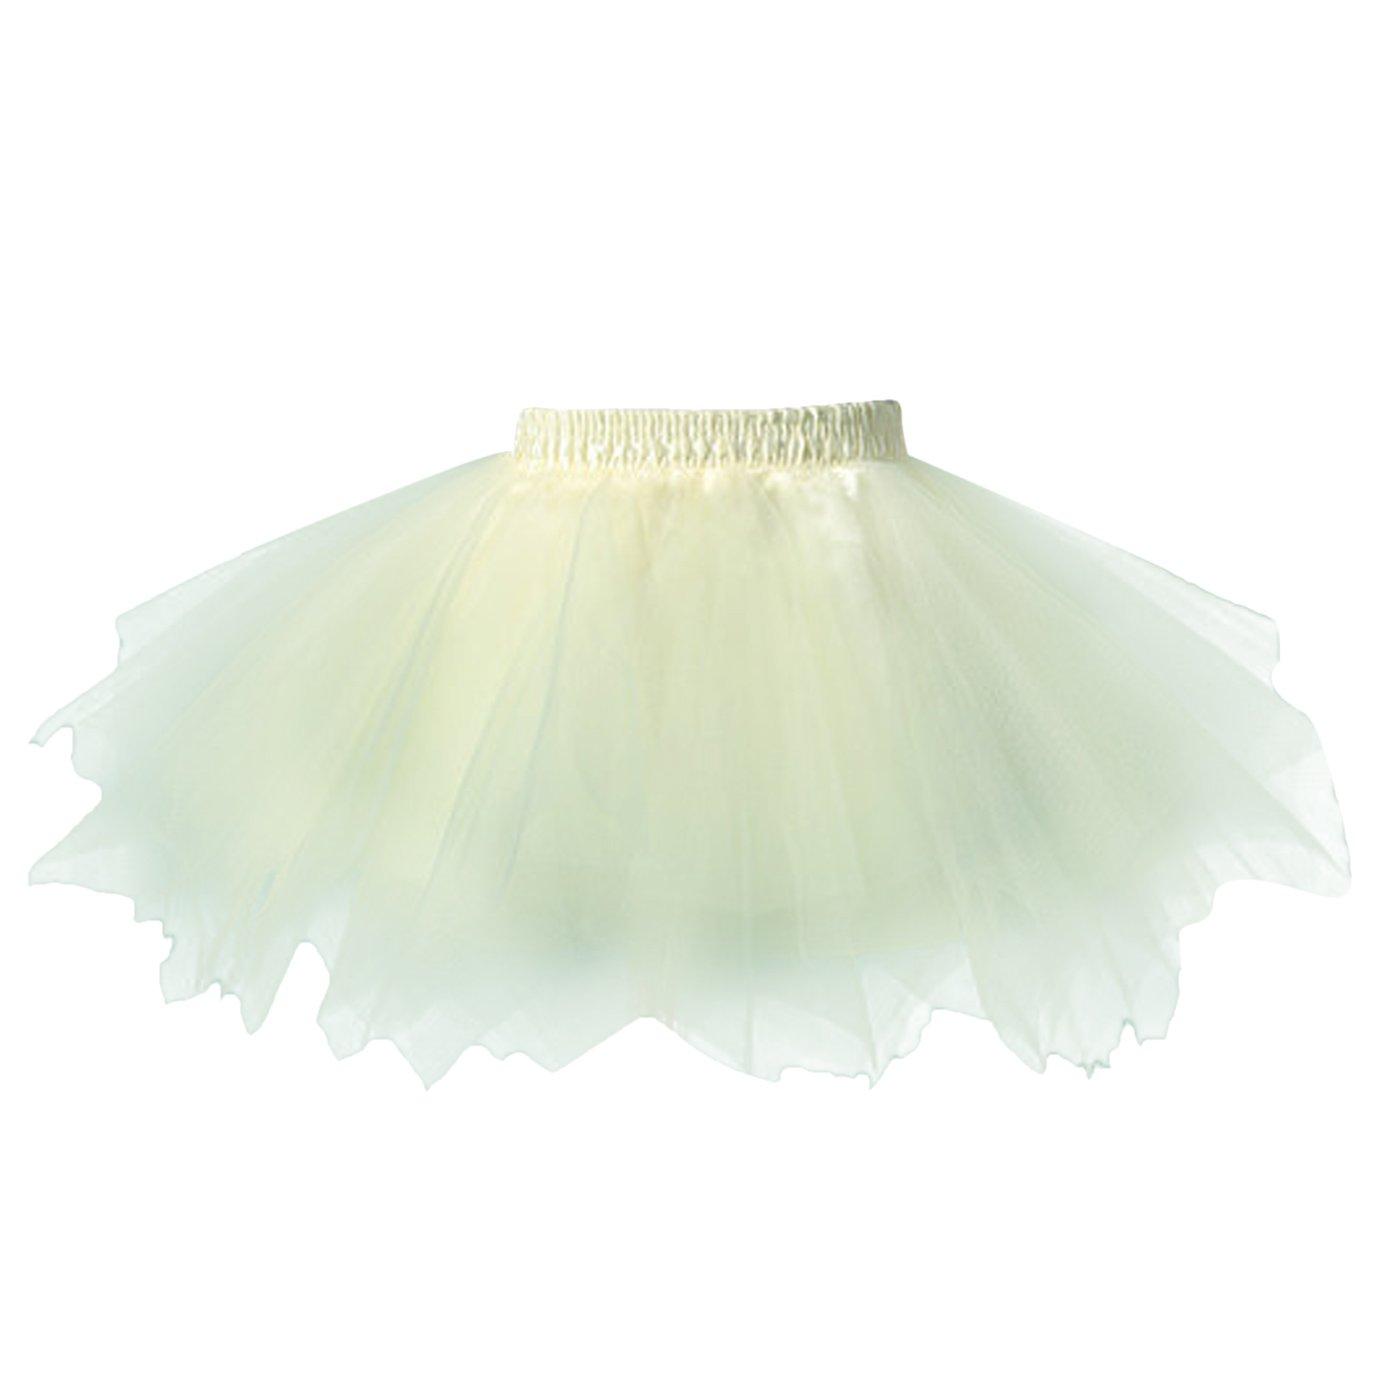 3107d8fe7 FEOYA Niñas Falda de Tul Tutú Clásica de Ballet para Disfraz Halloween  Fiesta Color Amarillo PP23FS2841